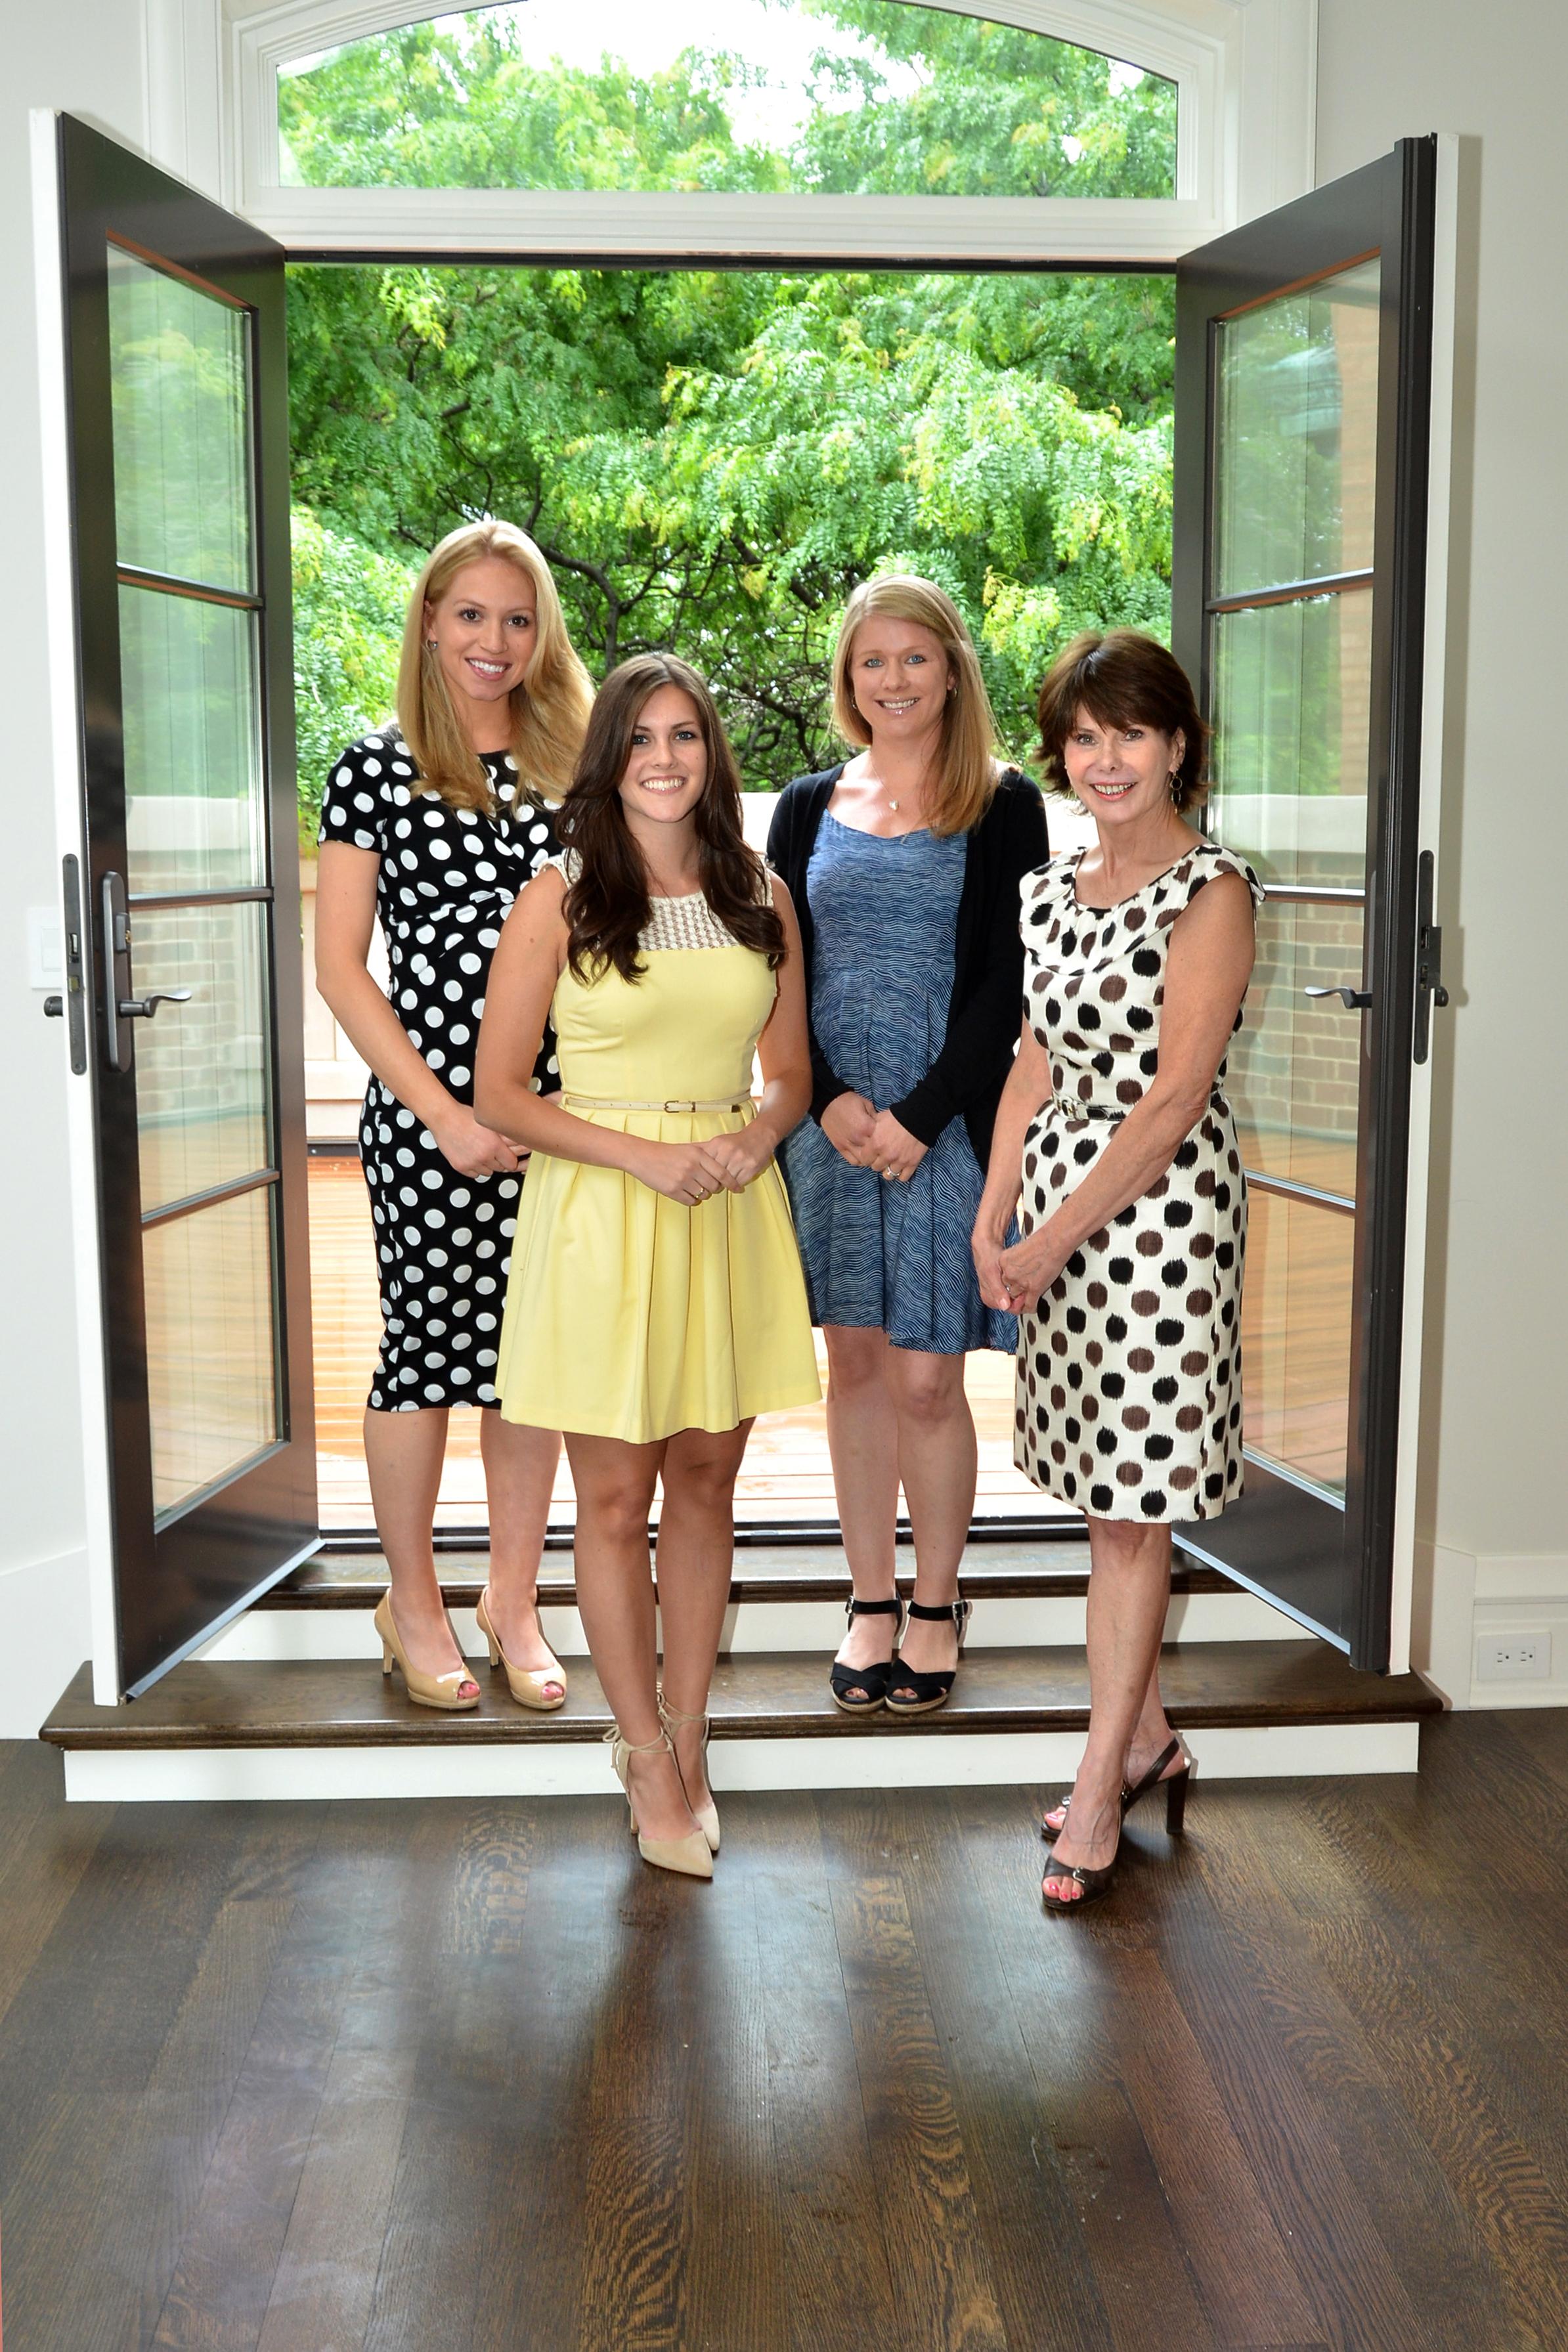 000-Lydia-Smith-Michelle-Walker-Jenny-Anderson-Millie-Rosenbloom-jpg.jpg